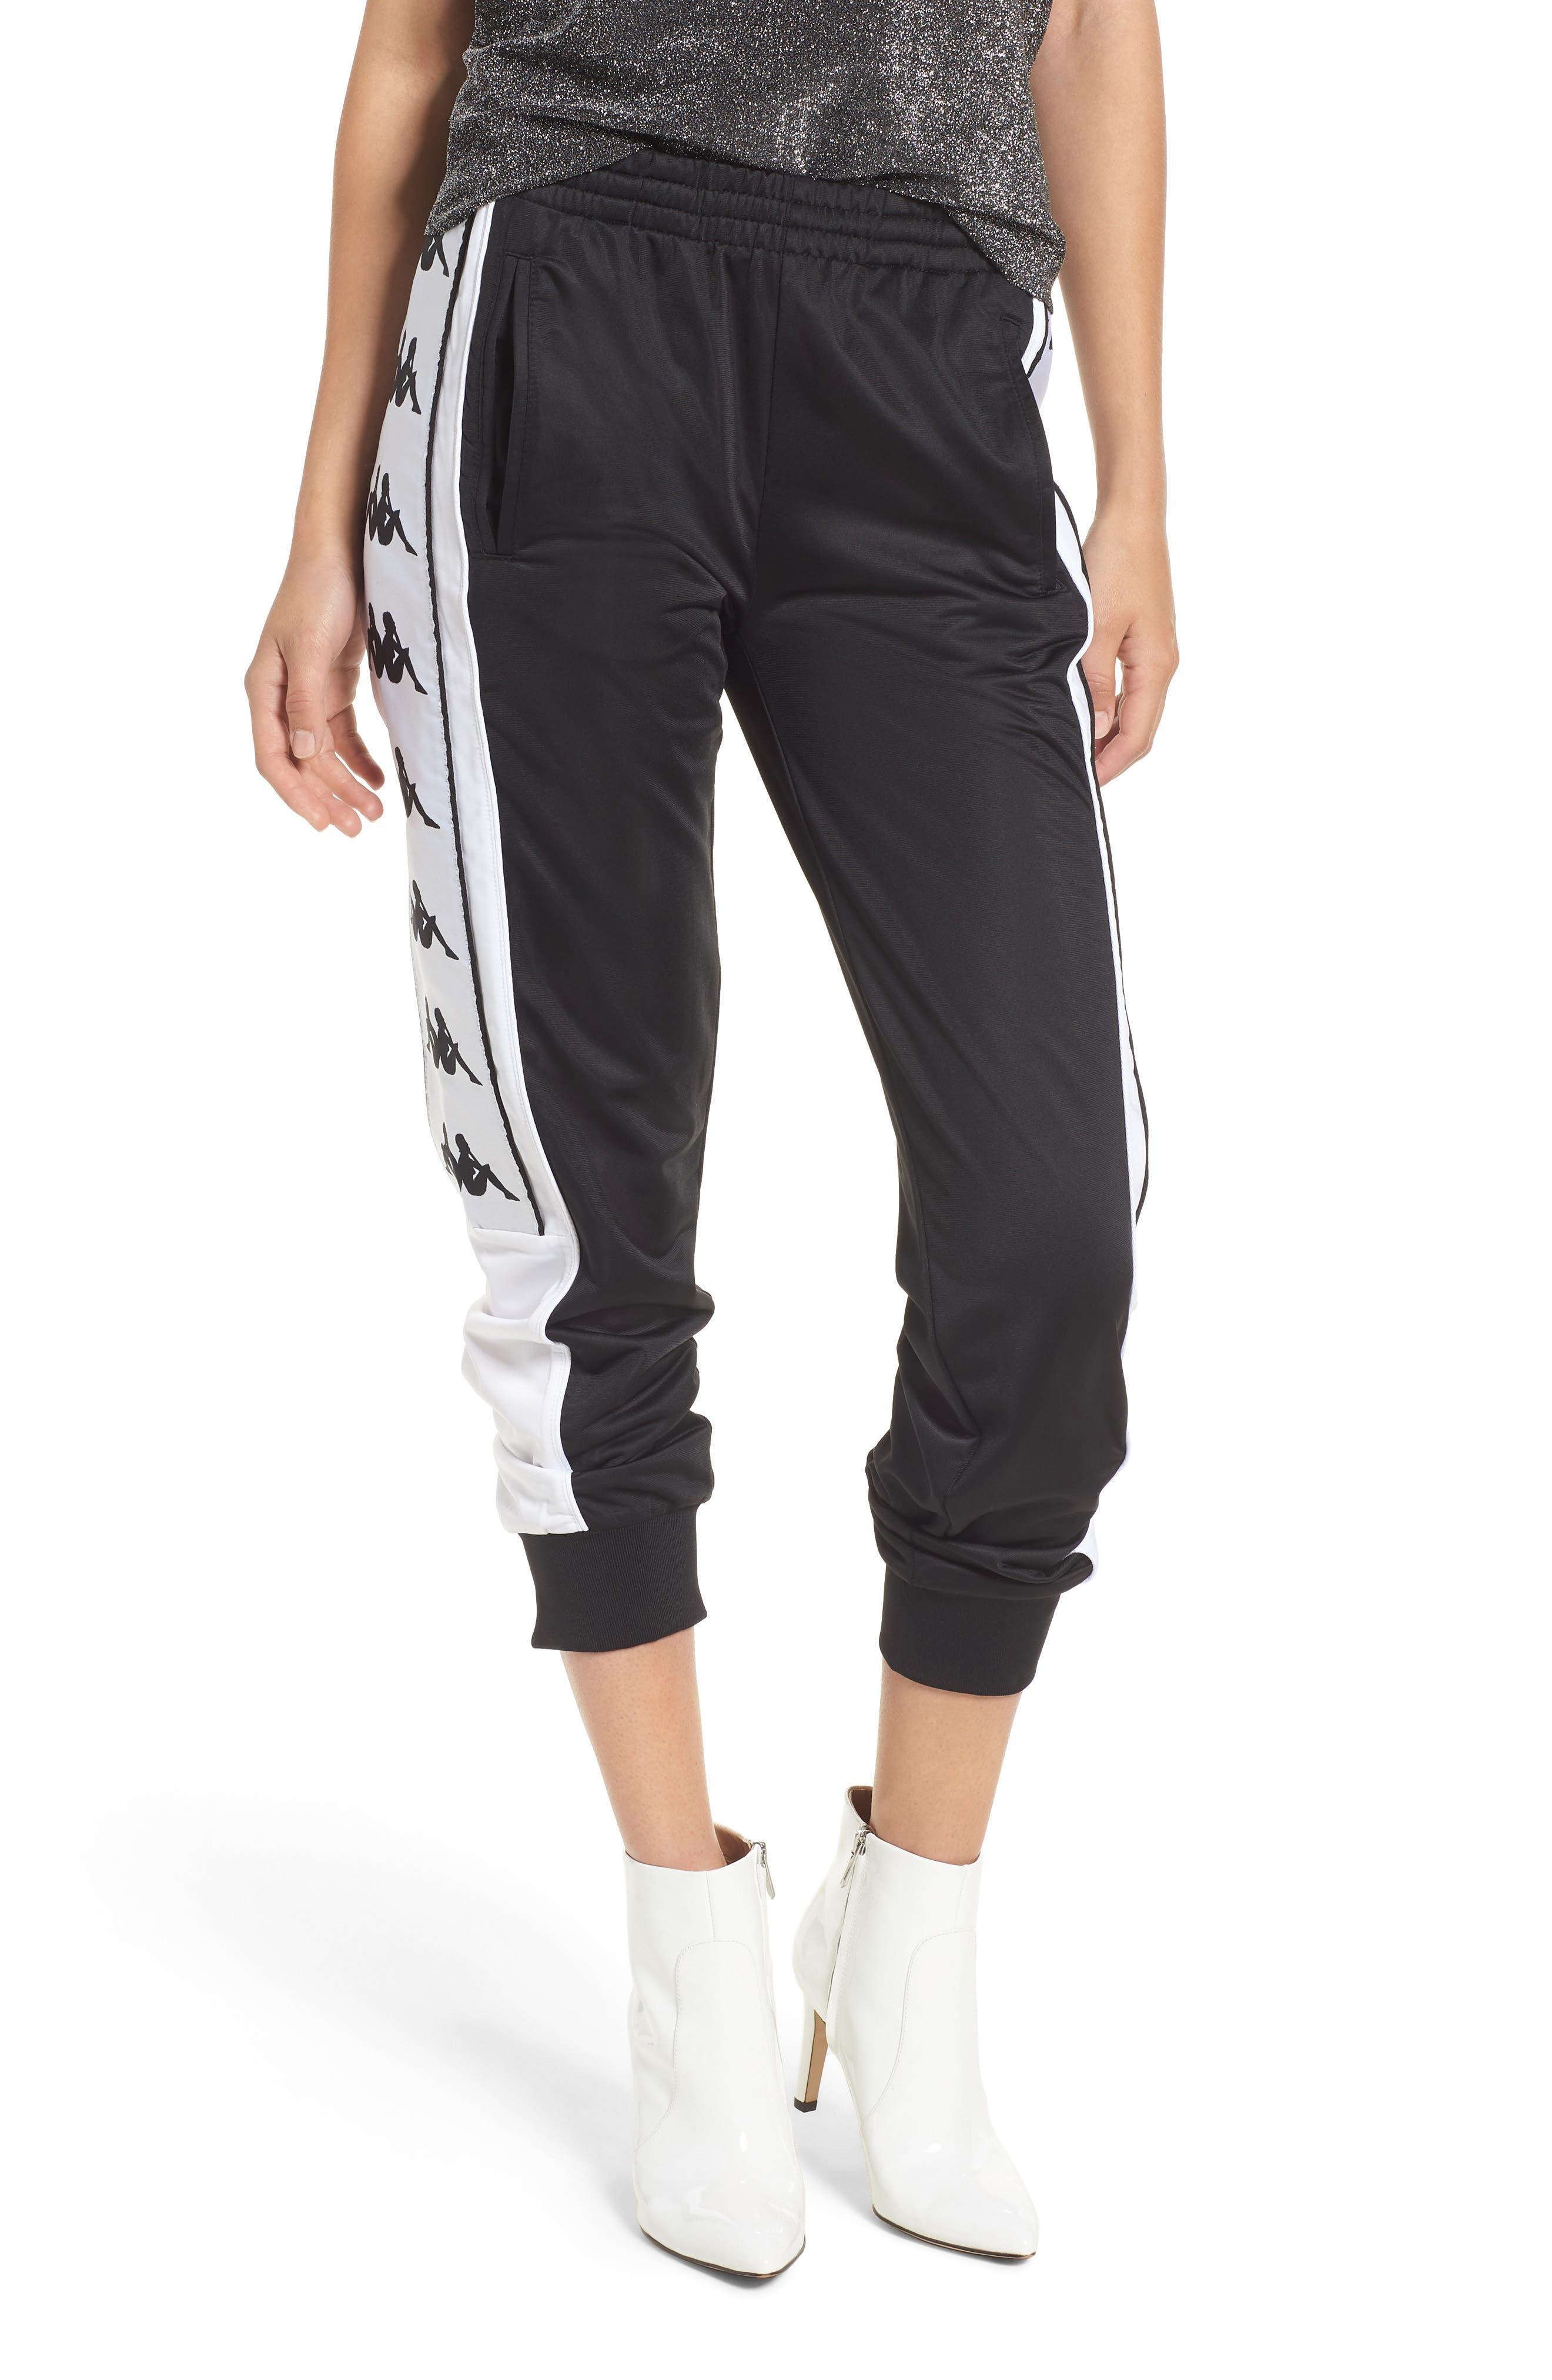 222 Banda 10 Arsis Pants, Black-White